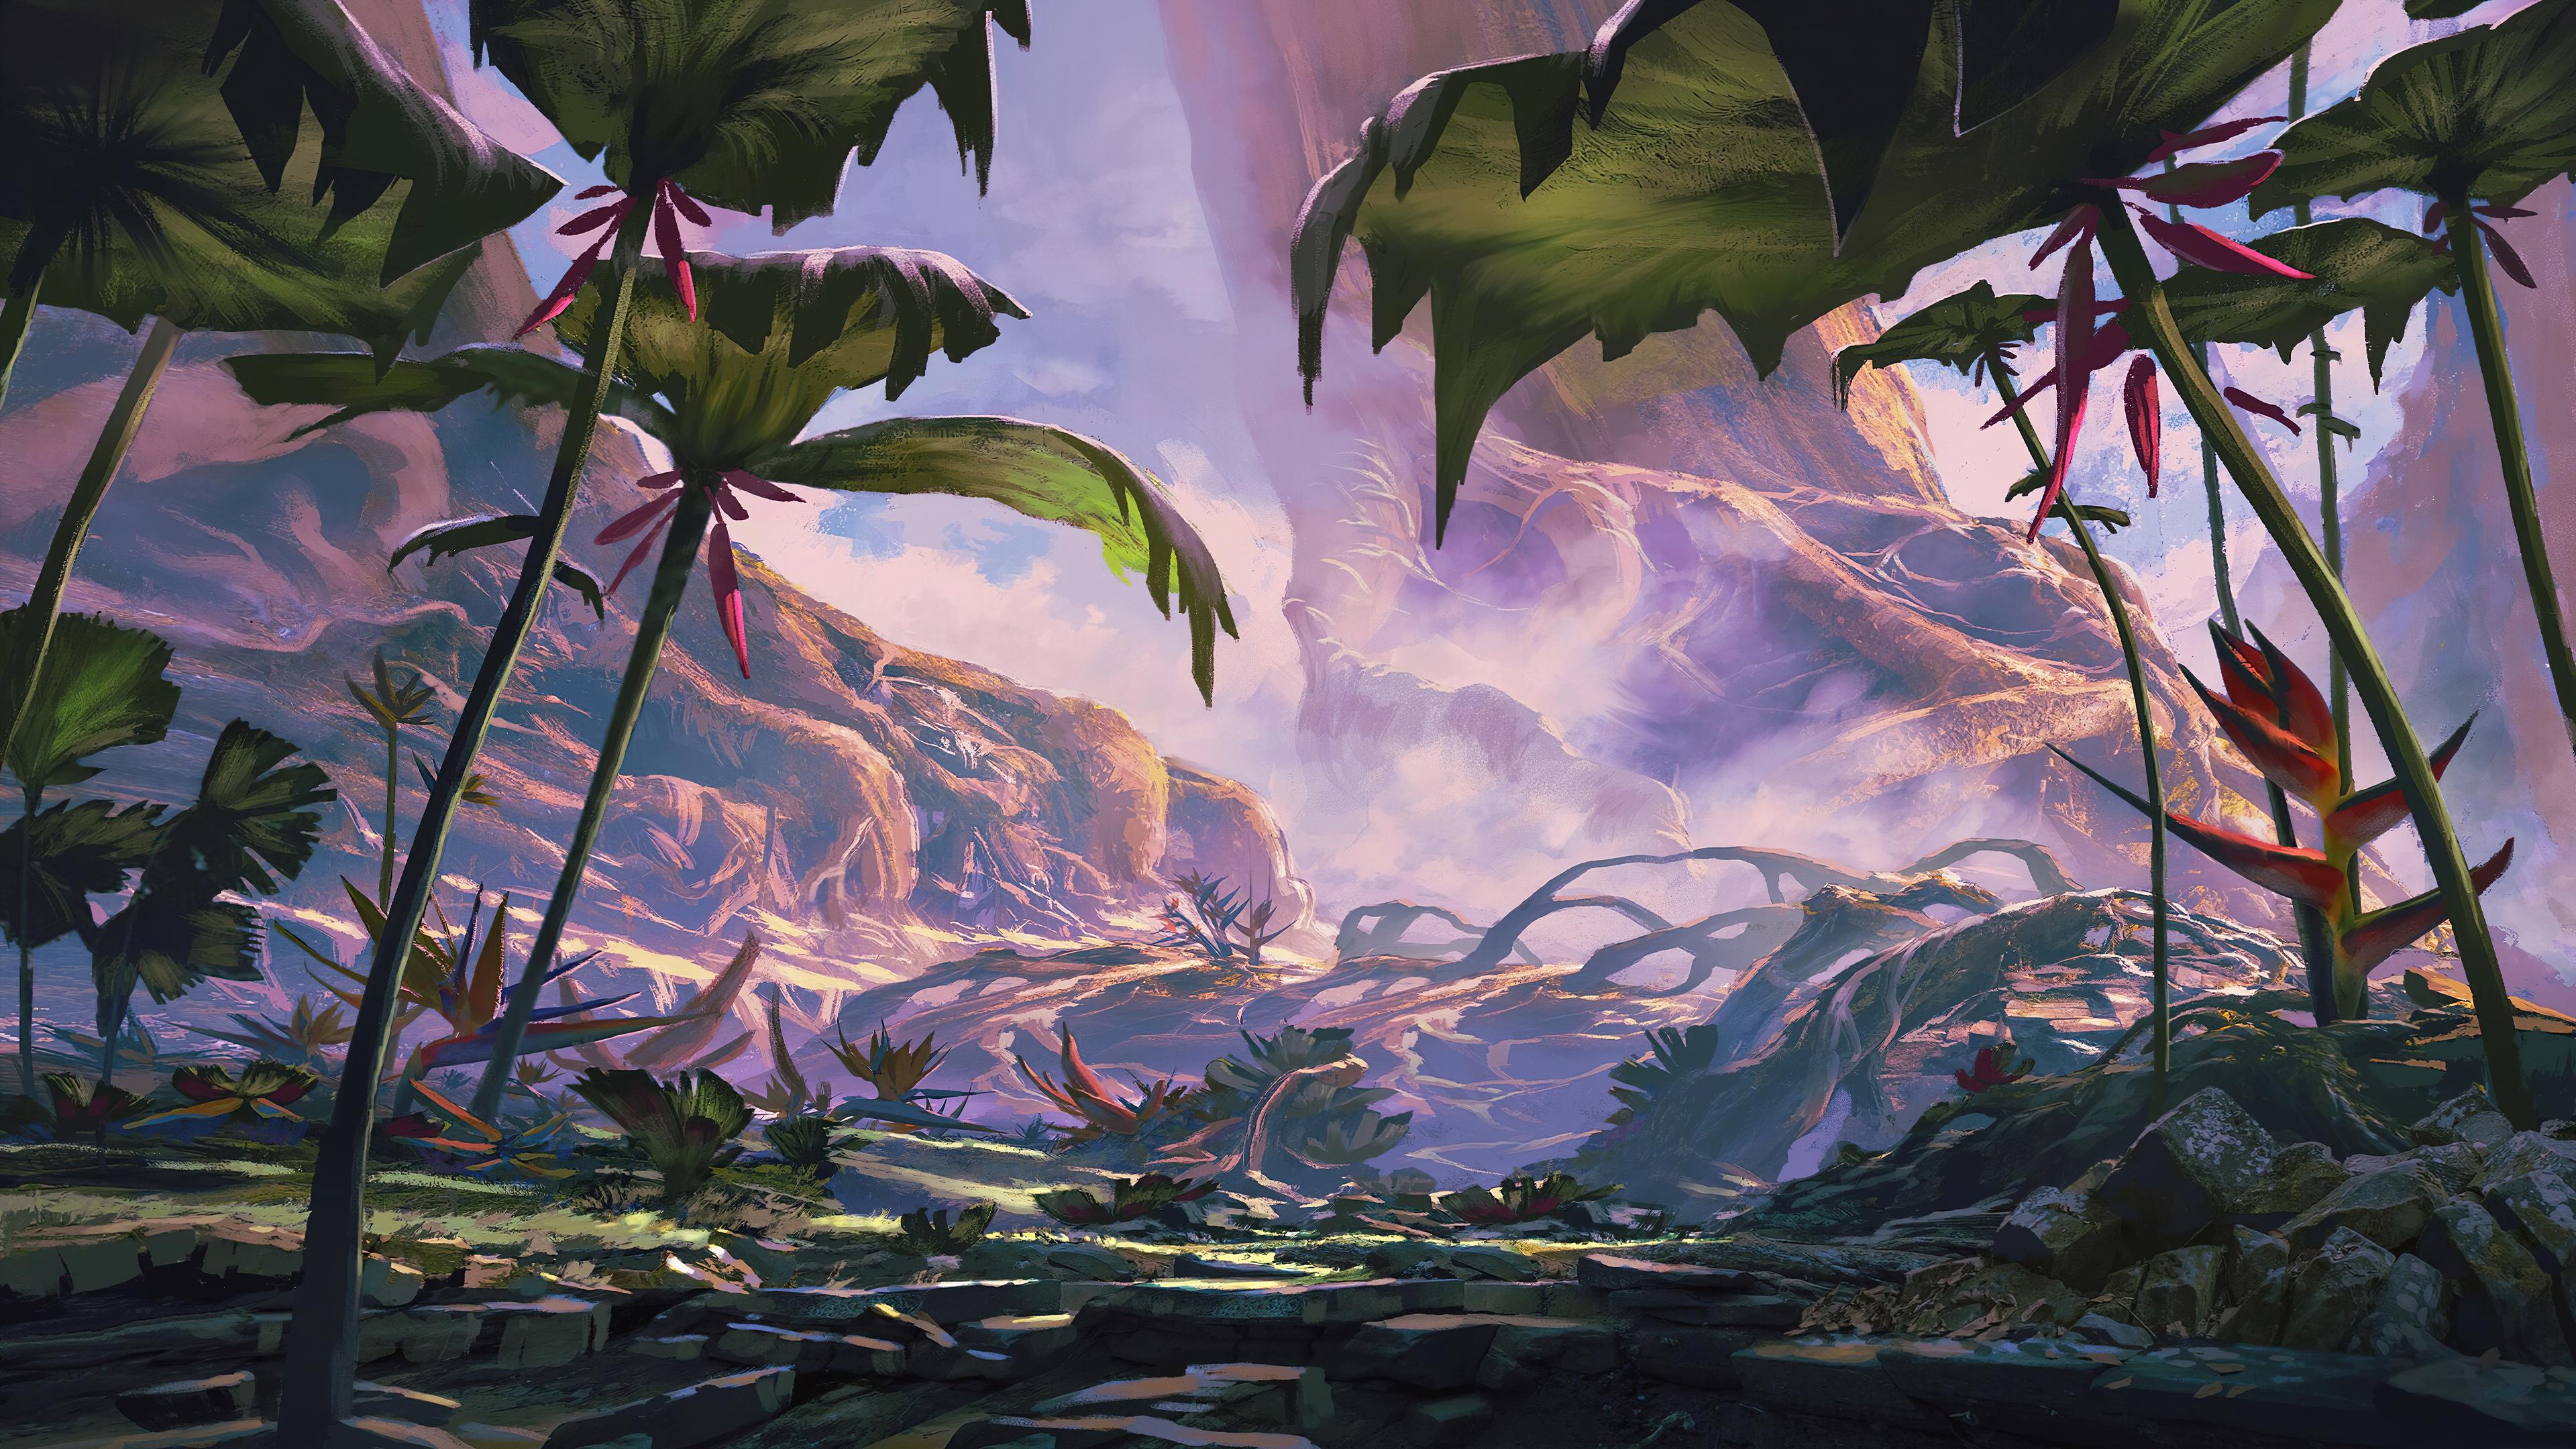 General 3840x2160 fantasy art plants Monster Hunter: World